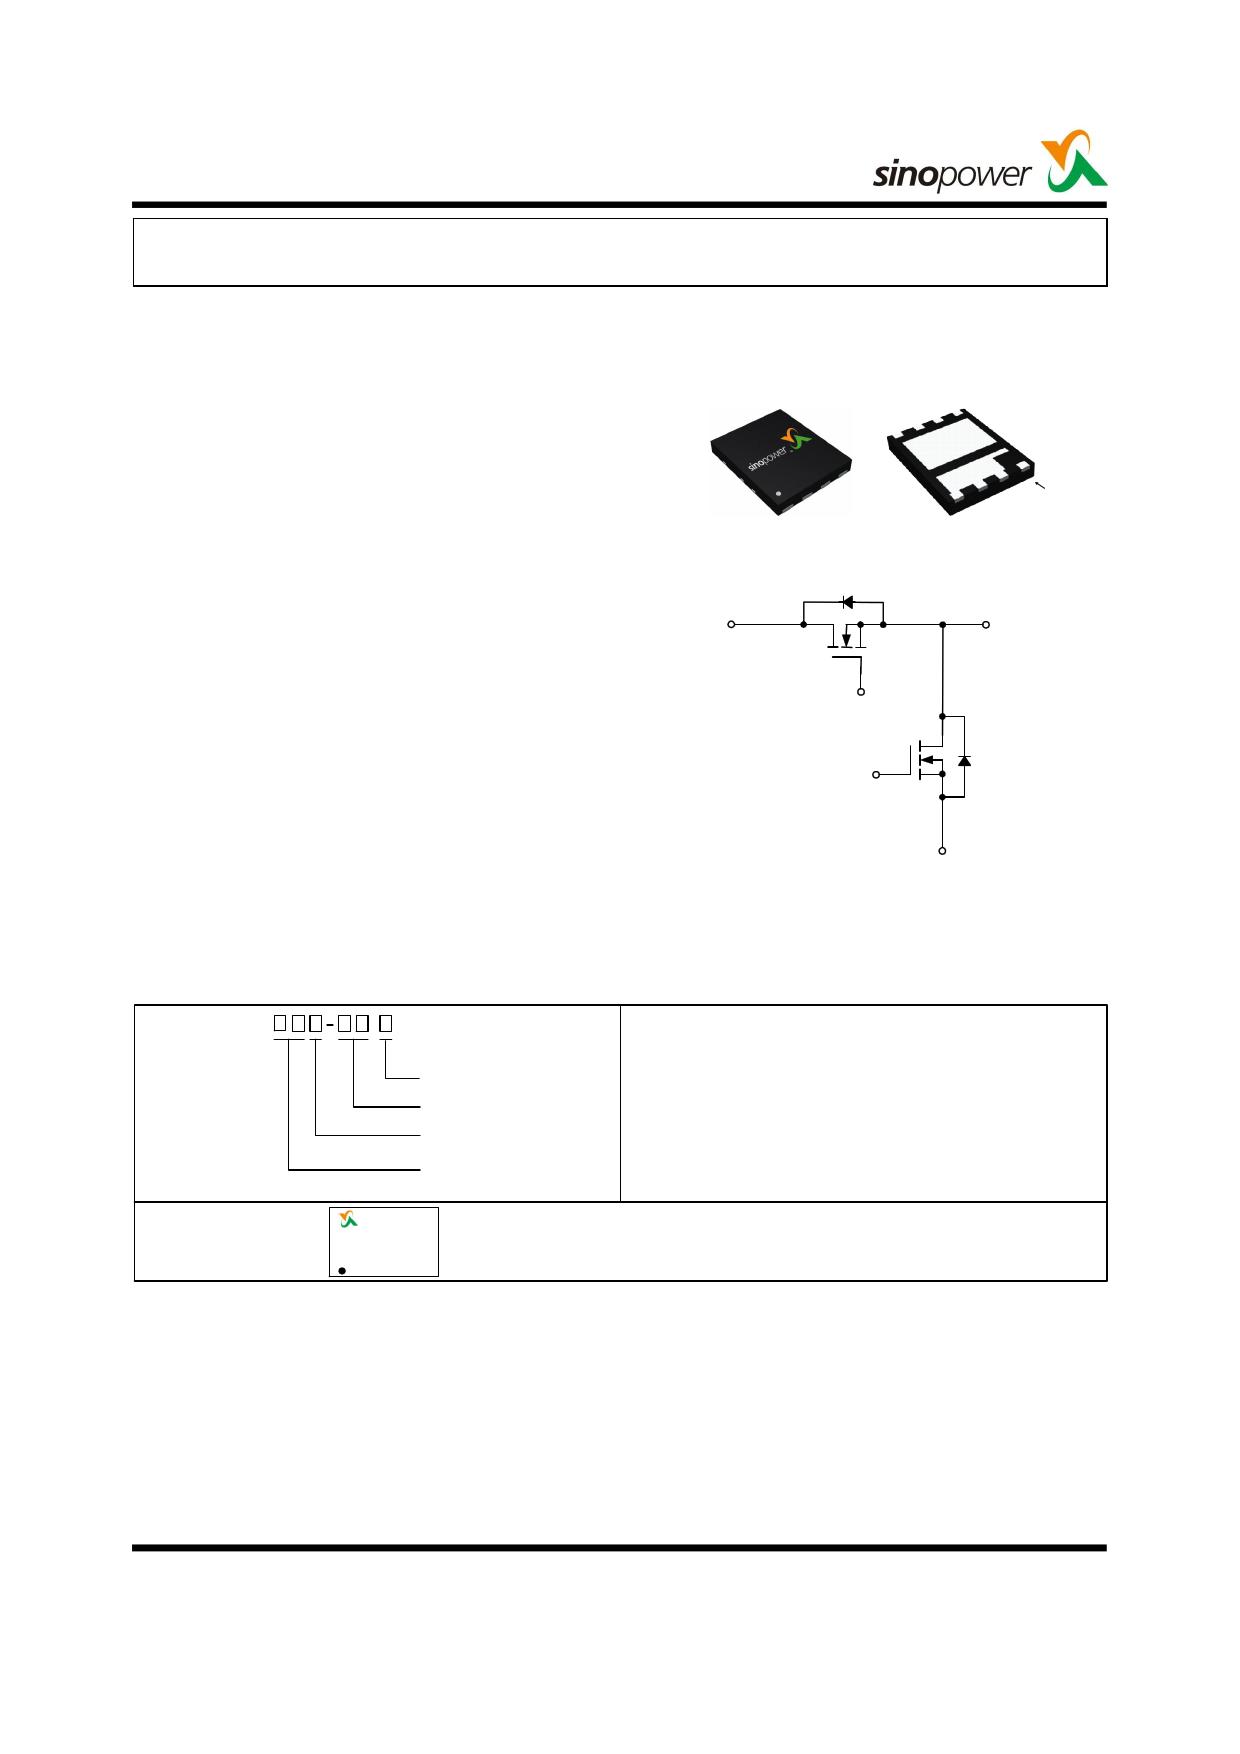 SM7320ESQG datasheet pinout pdf